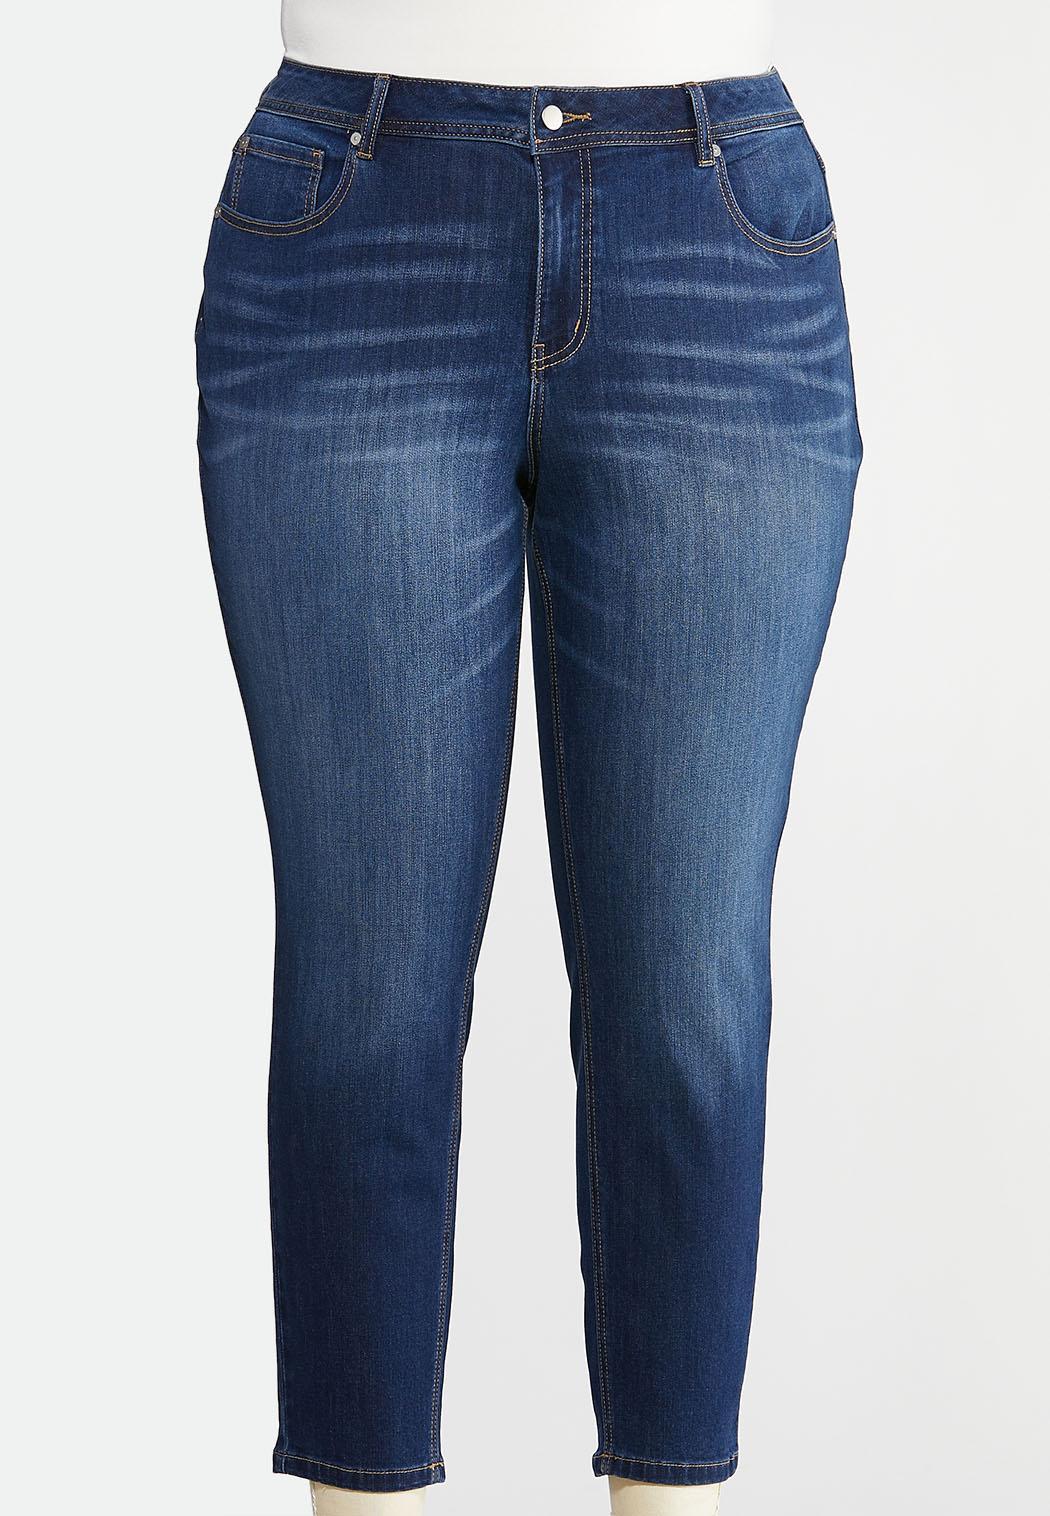 910f80f995 Plus Size Women's Jeans: Women's Denim, Jackets, Skirts & Vests